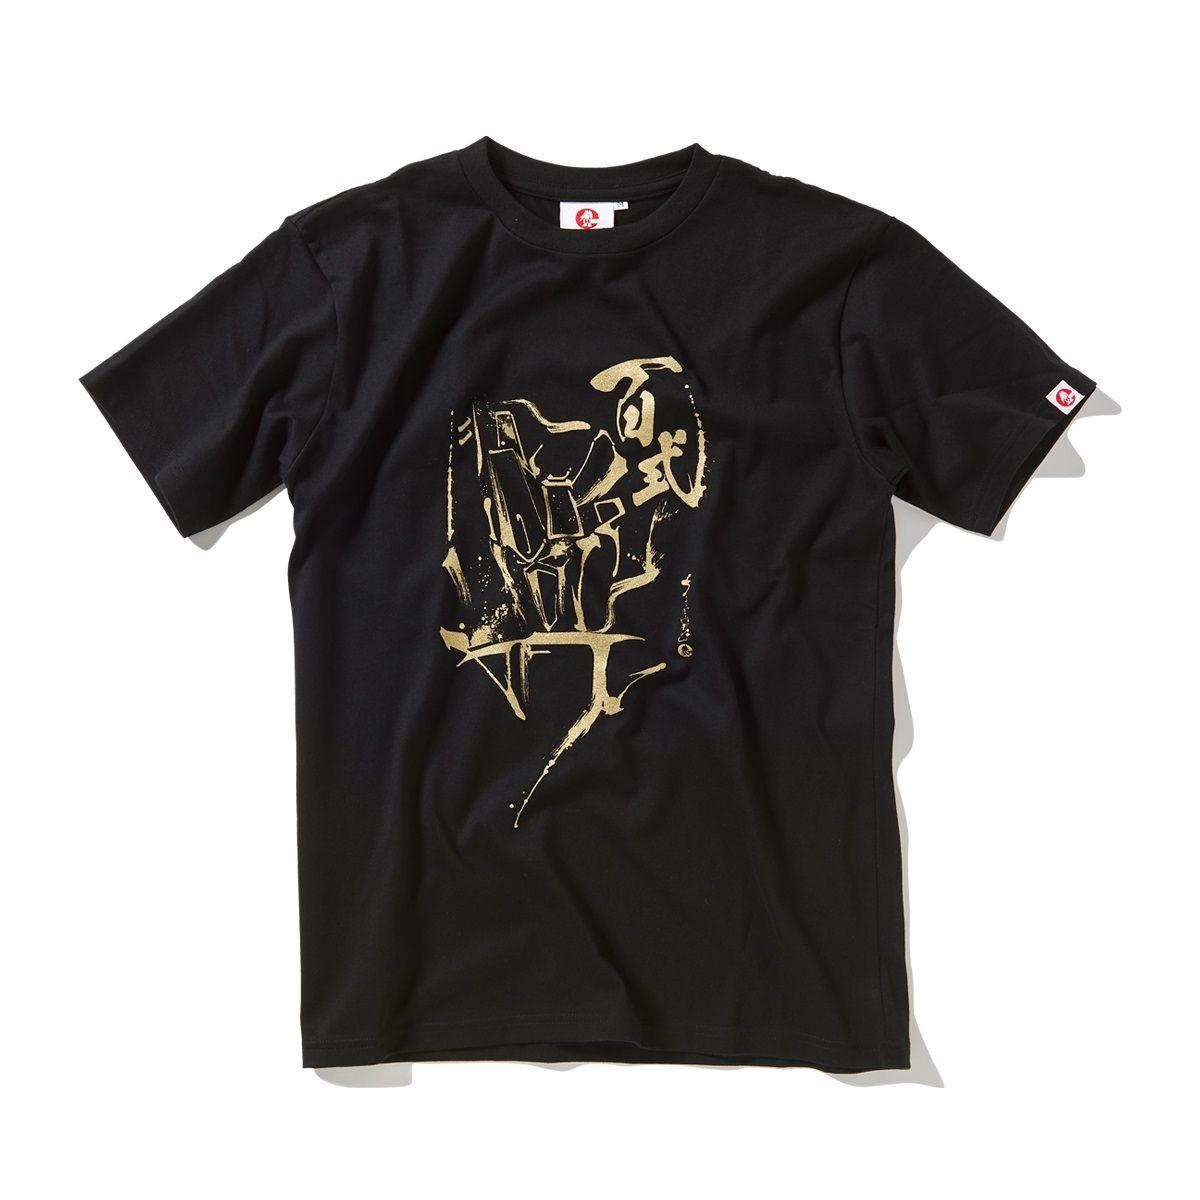 Hyaku Shiki T-shirt—Mobile Suit Zeta Gundam/STRICT-G JAPAN Collaboration